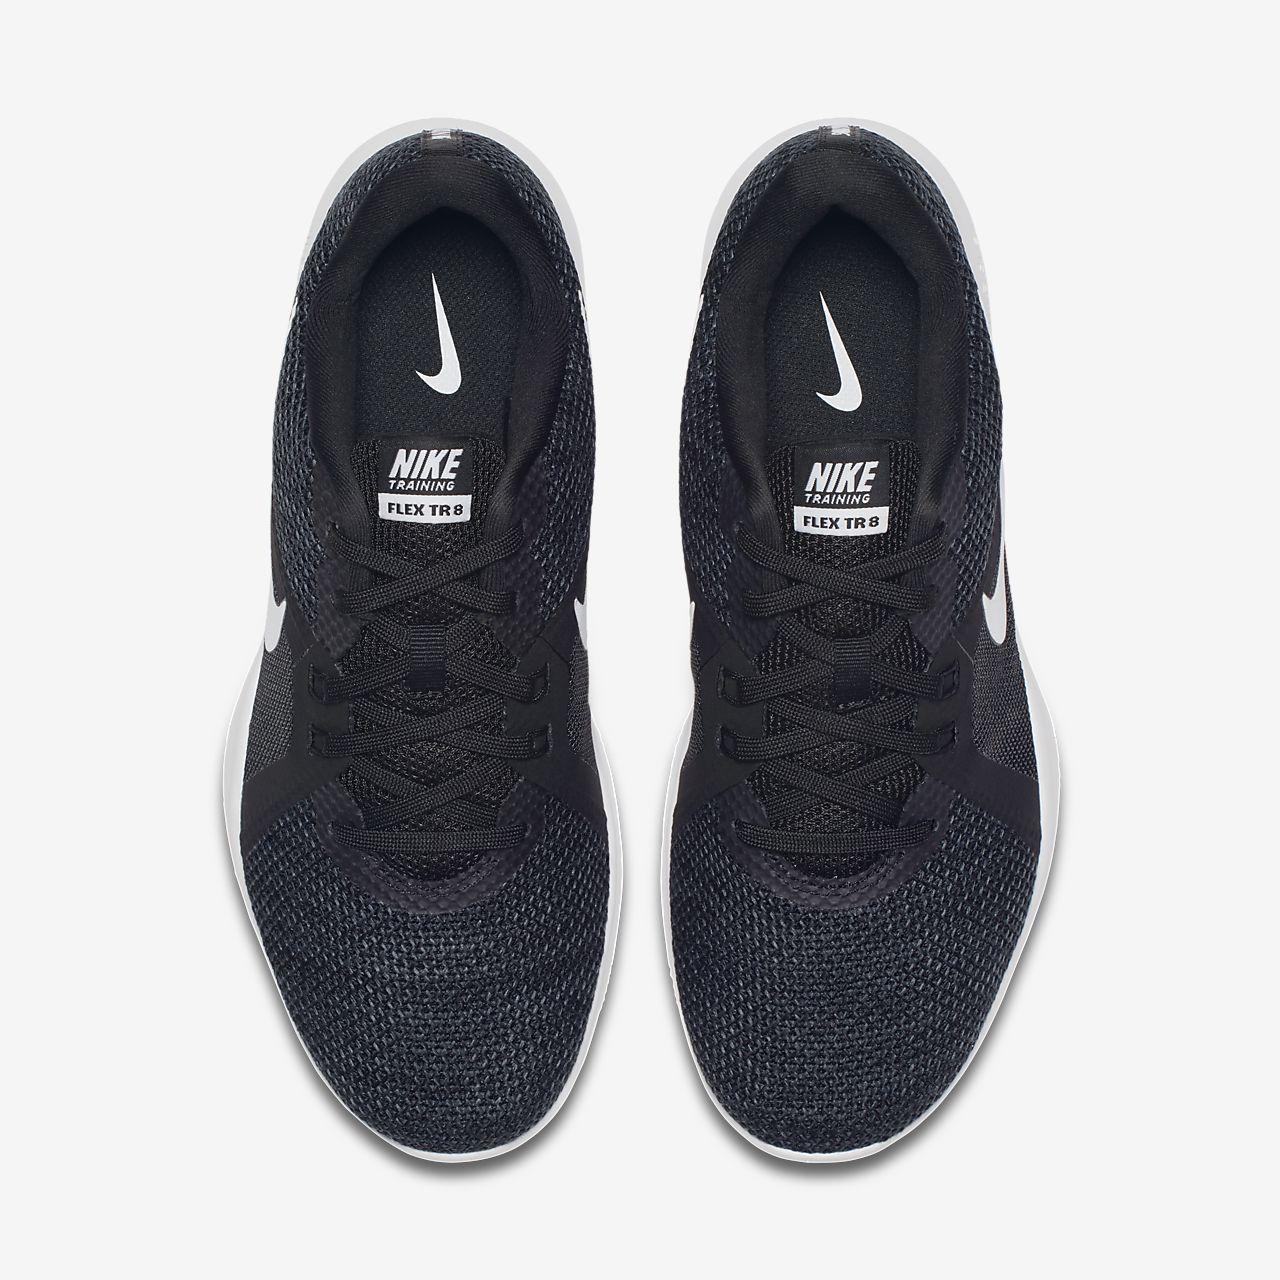 f712901b8ddf7 Nike Flex Trainer 8 (Wide) Women s Training Shoe. Nike.com